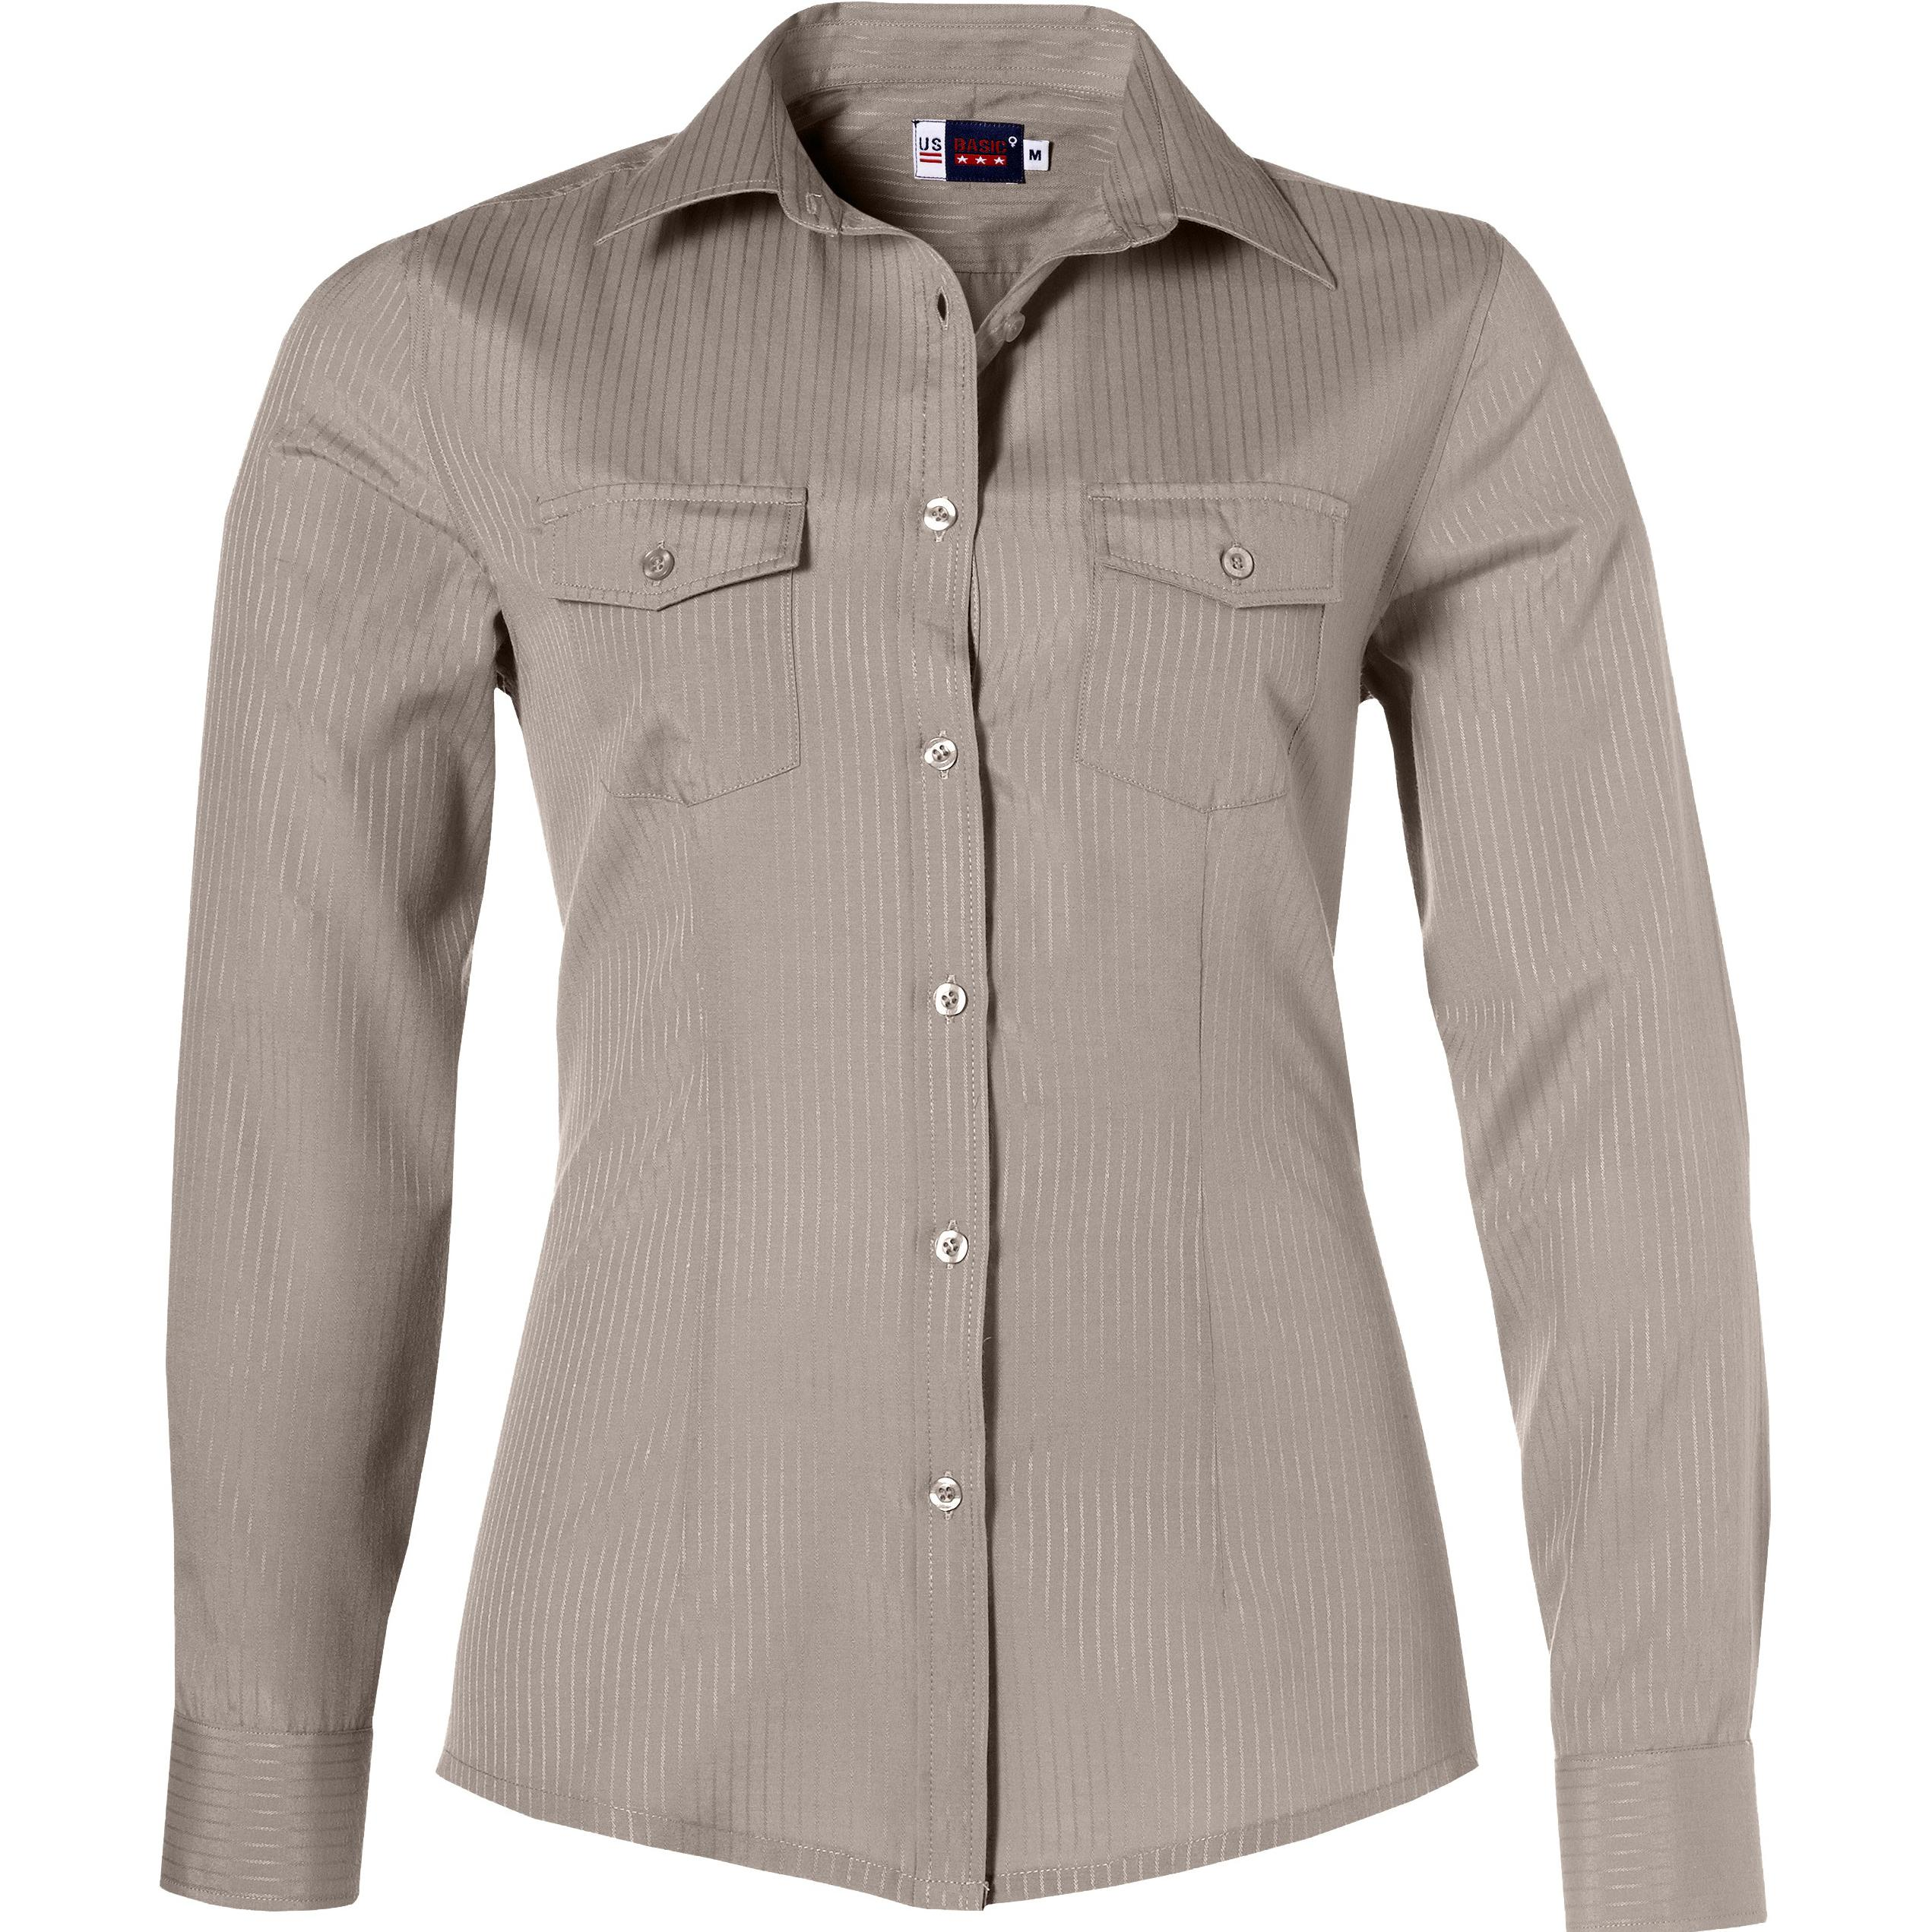 Ladies Long Sleeve Bayport Shirt - Khaki Only